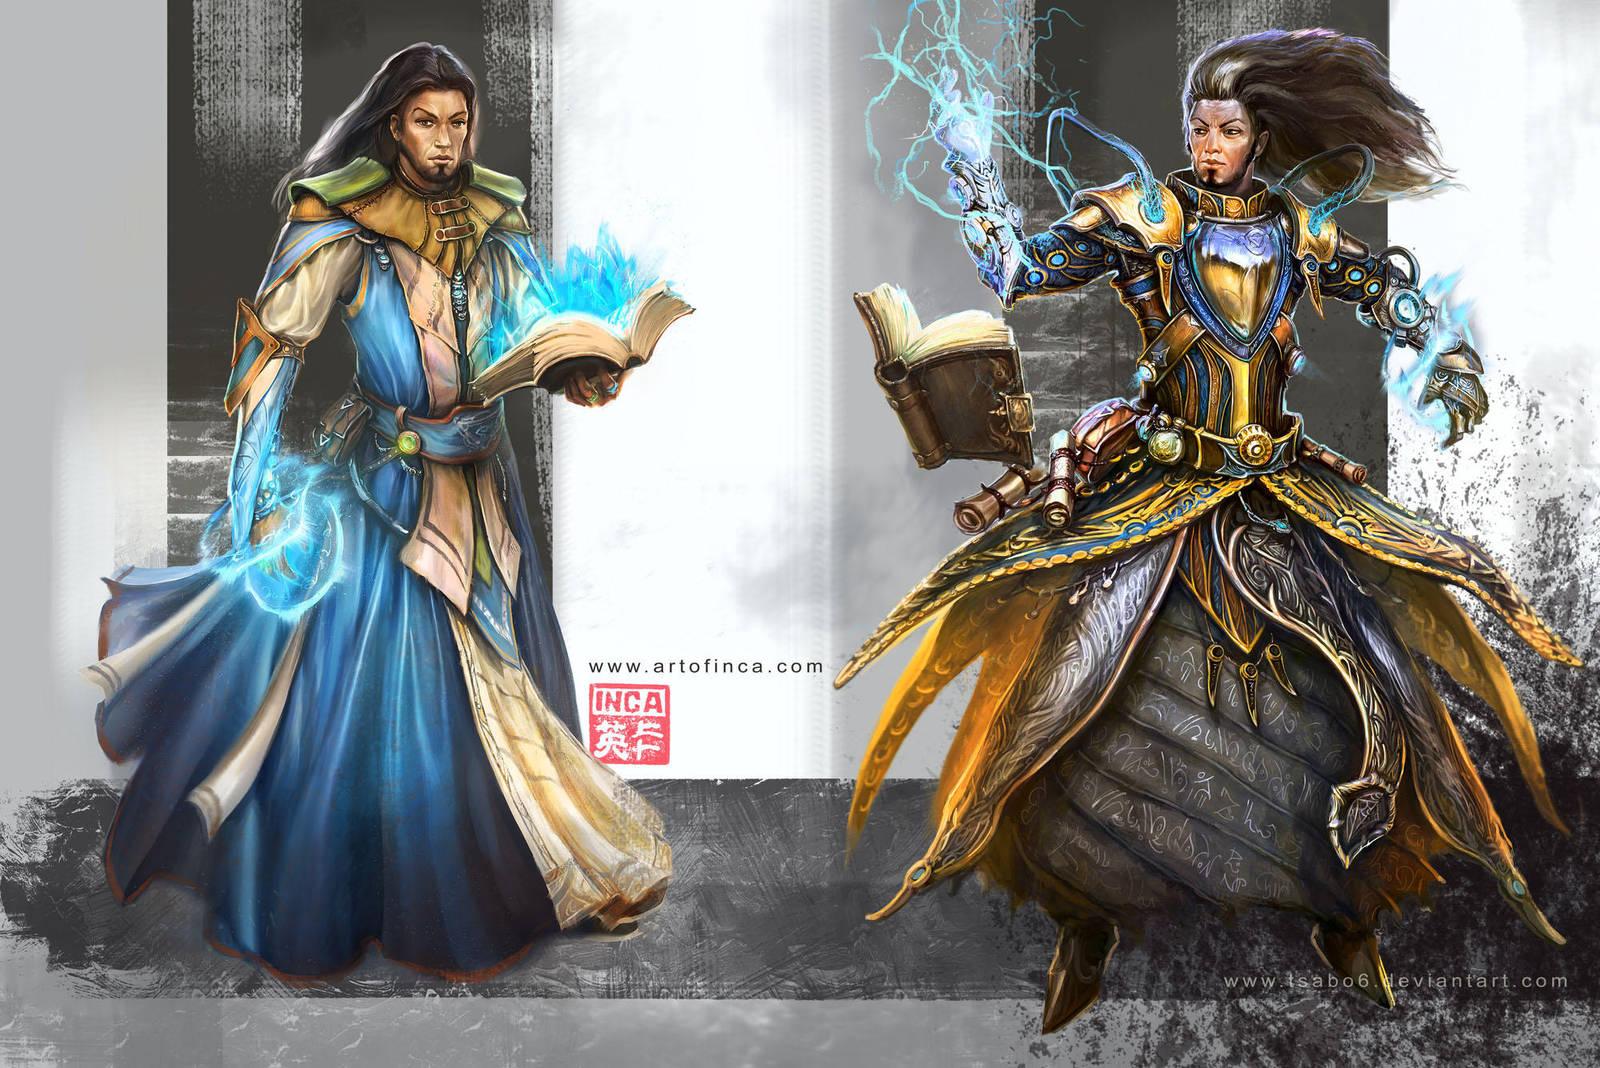 wizard concepts by Tsabo6